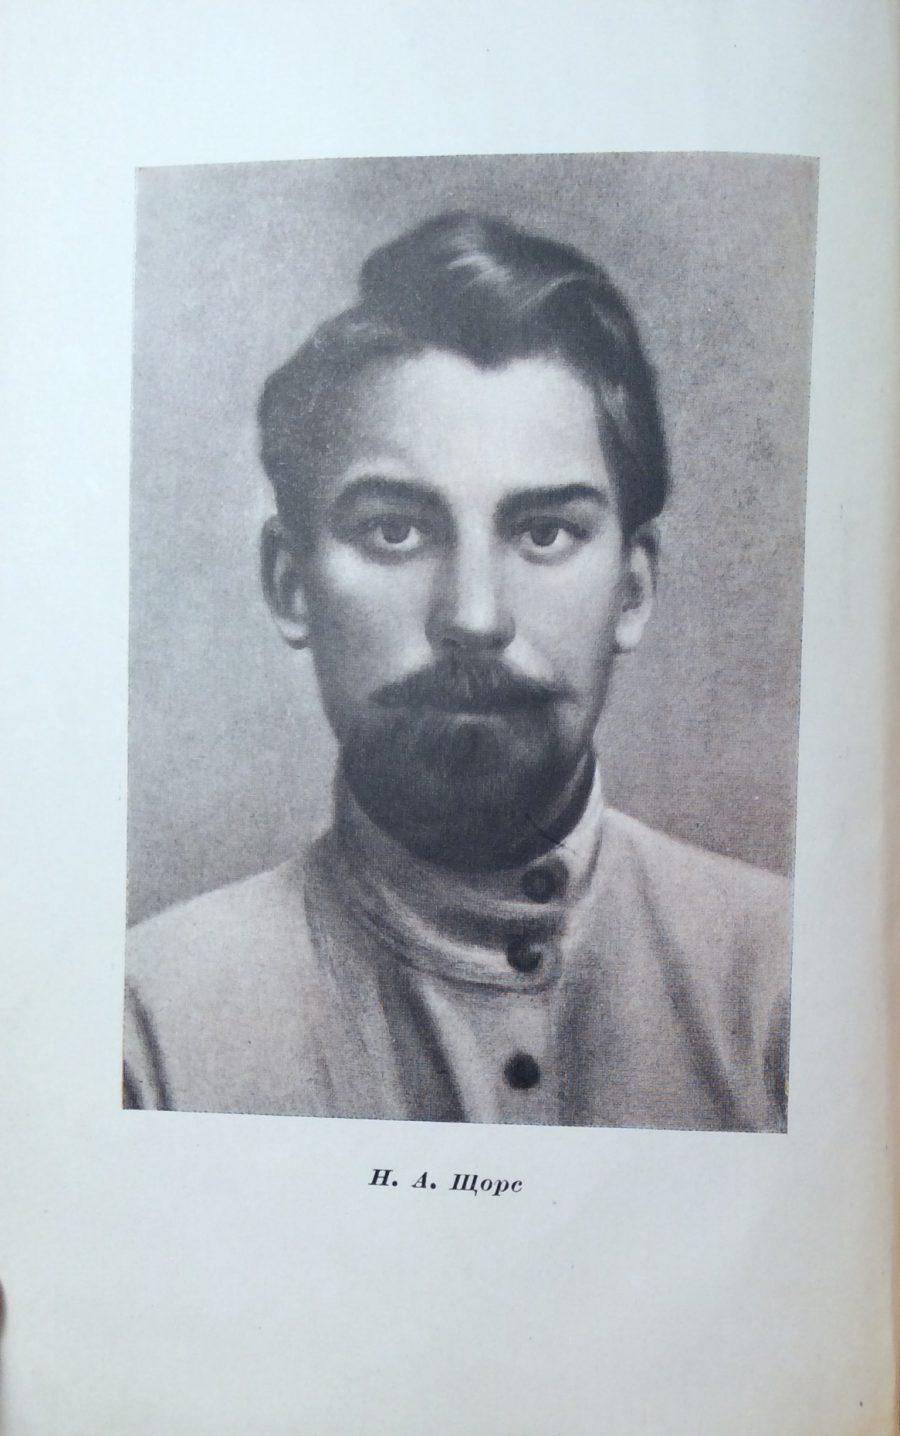 Герасимов Е.Н., Эрлих М.М. Николай Александрович Щорс